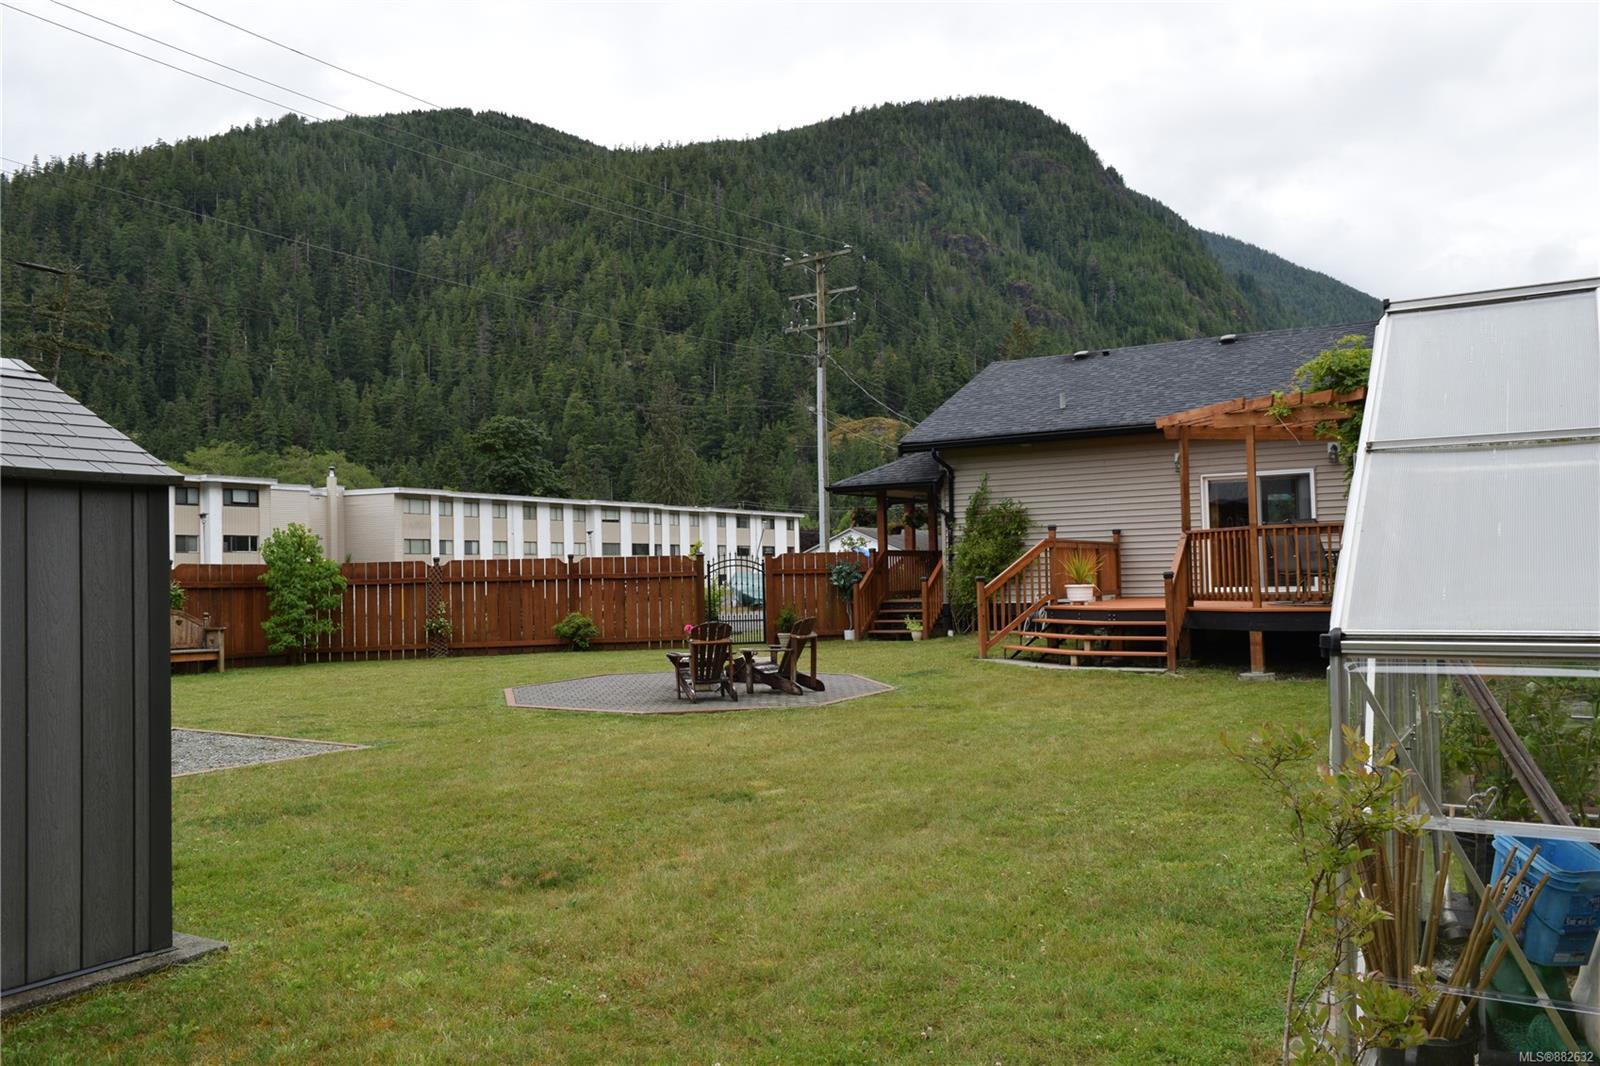 Photo 47 at 623 Alpine View Road, North Island